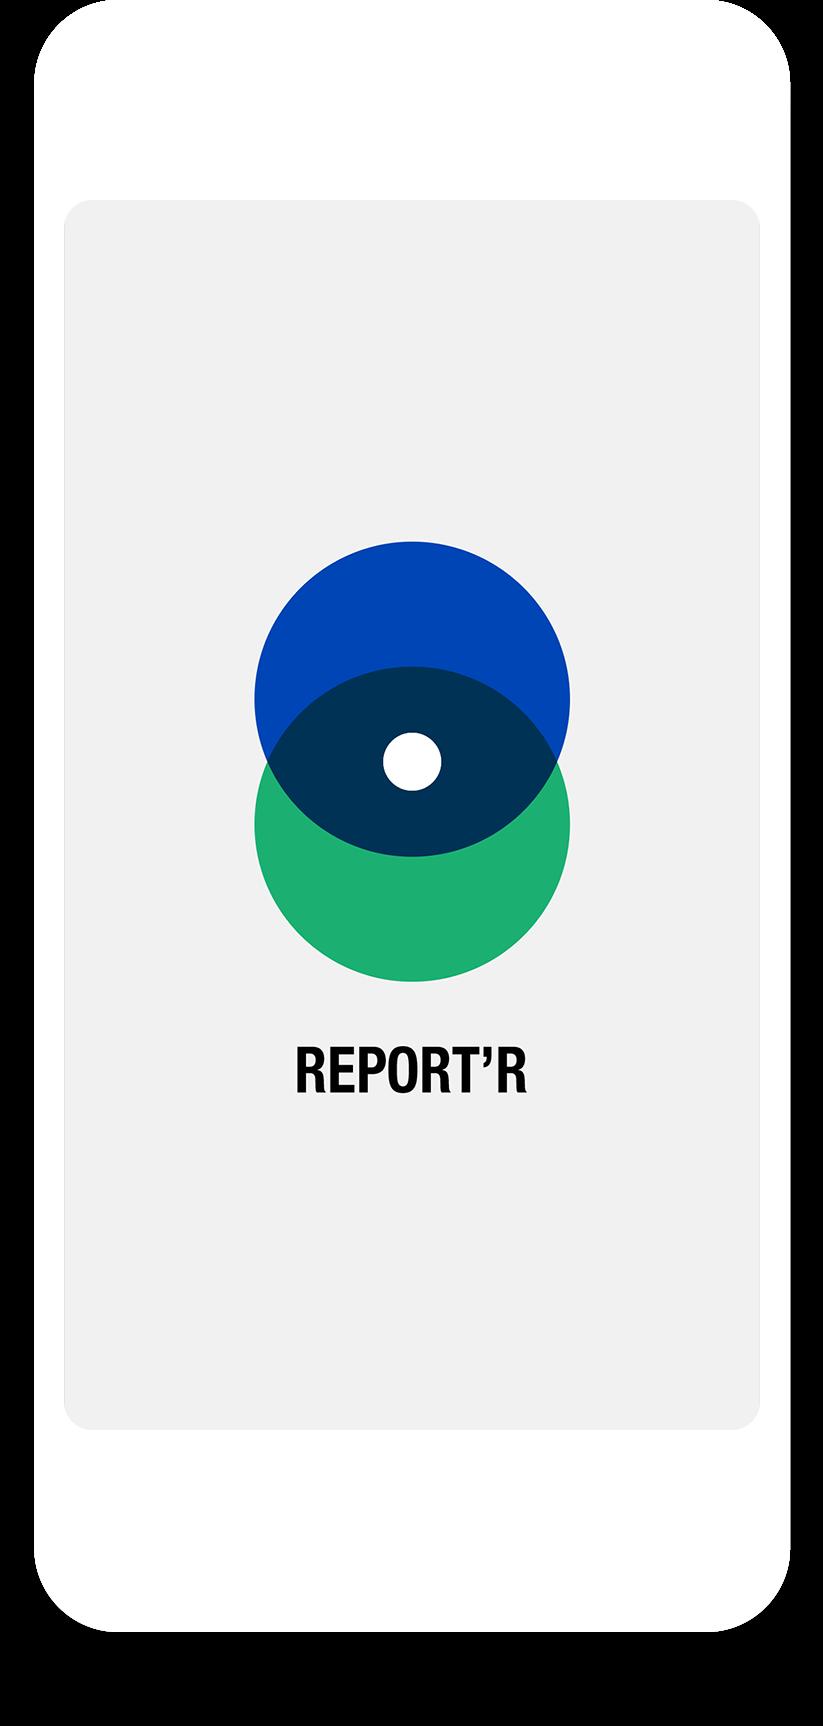 Groupe Renault - Image Slide 5